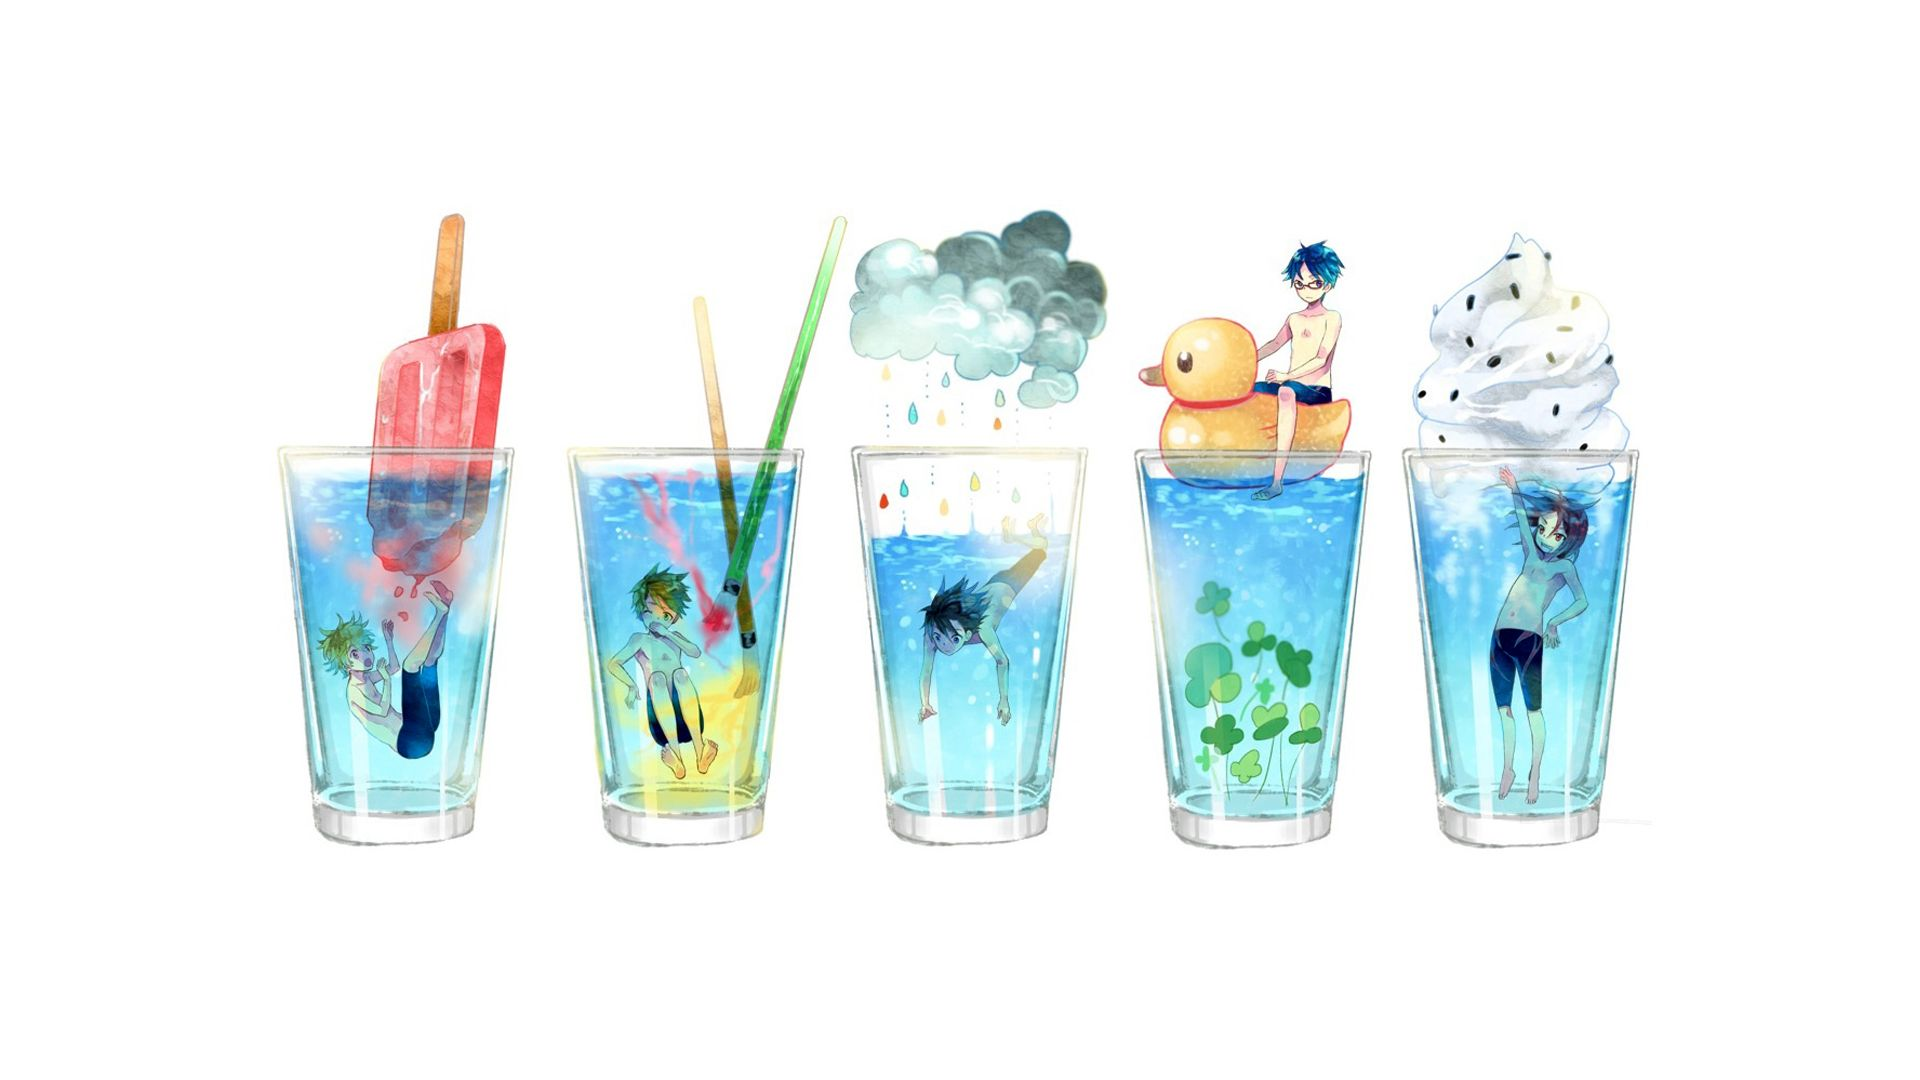 Free anime wallpaper tm vi google free pinterest free anime wallpaper tm vi google voltagebd Images